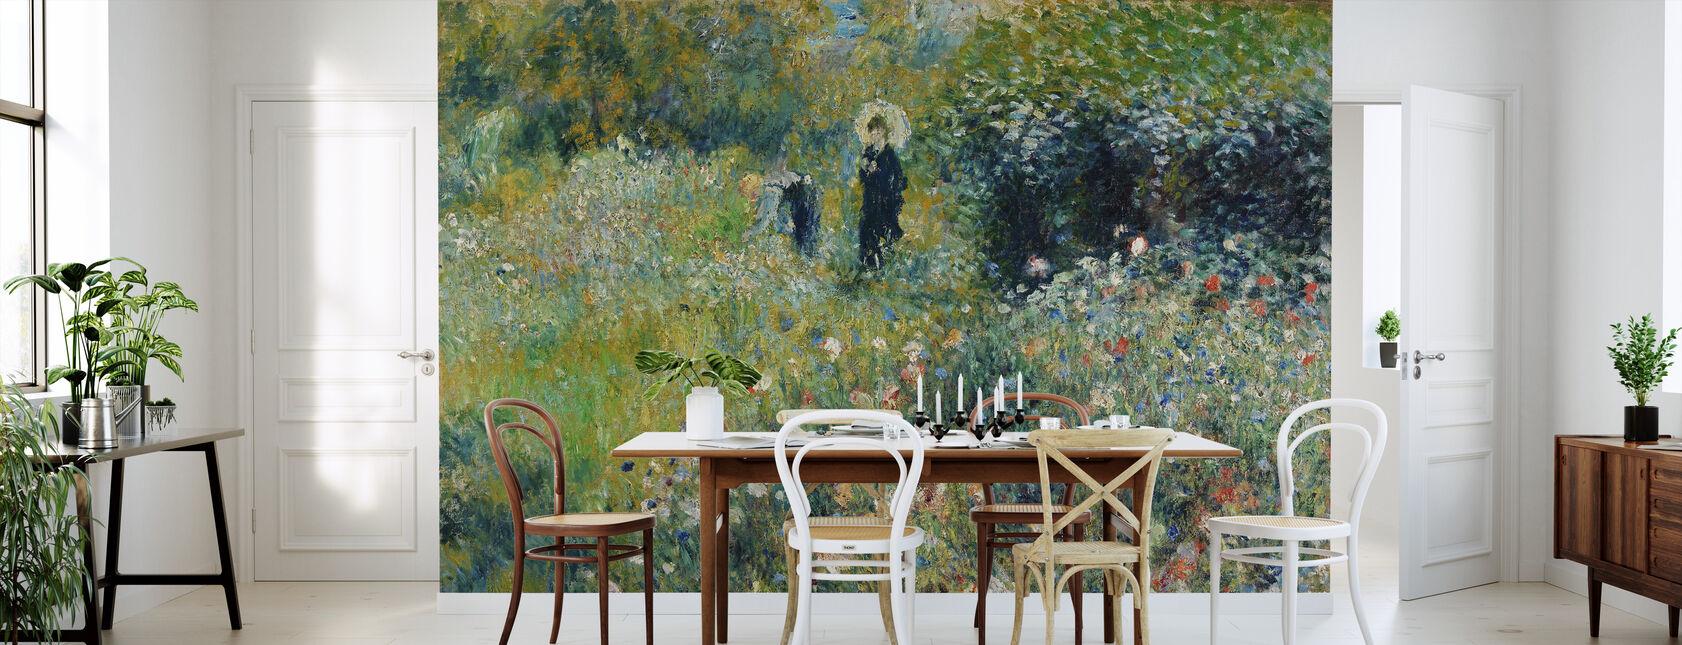 Woman in a Garden - Pierre Auguste Renoir - Wallpaper - Kitchen